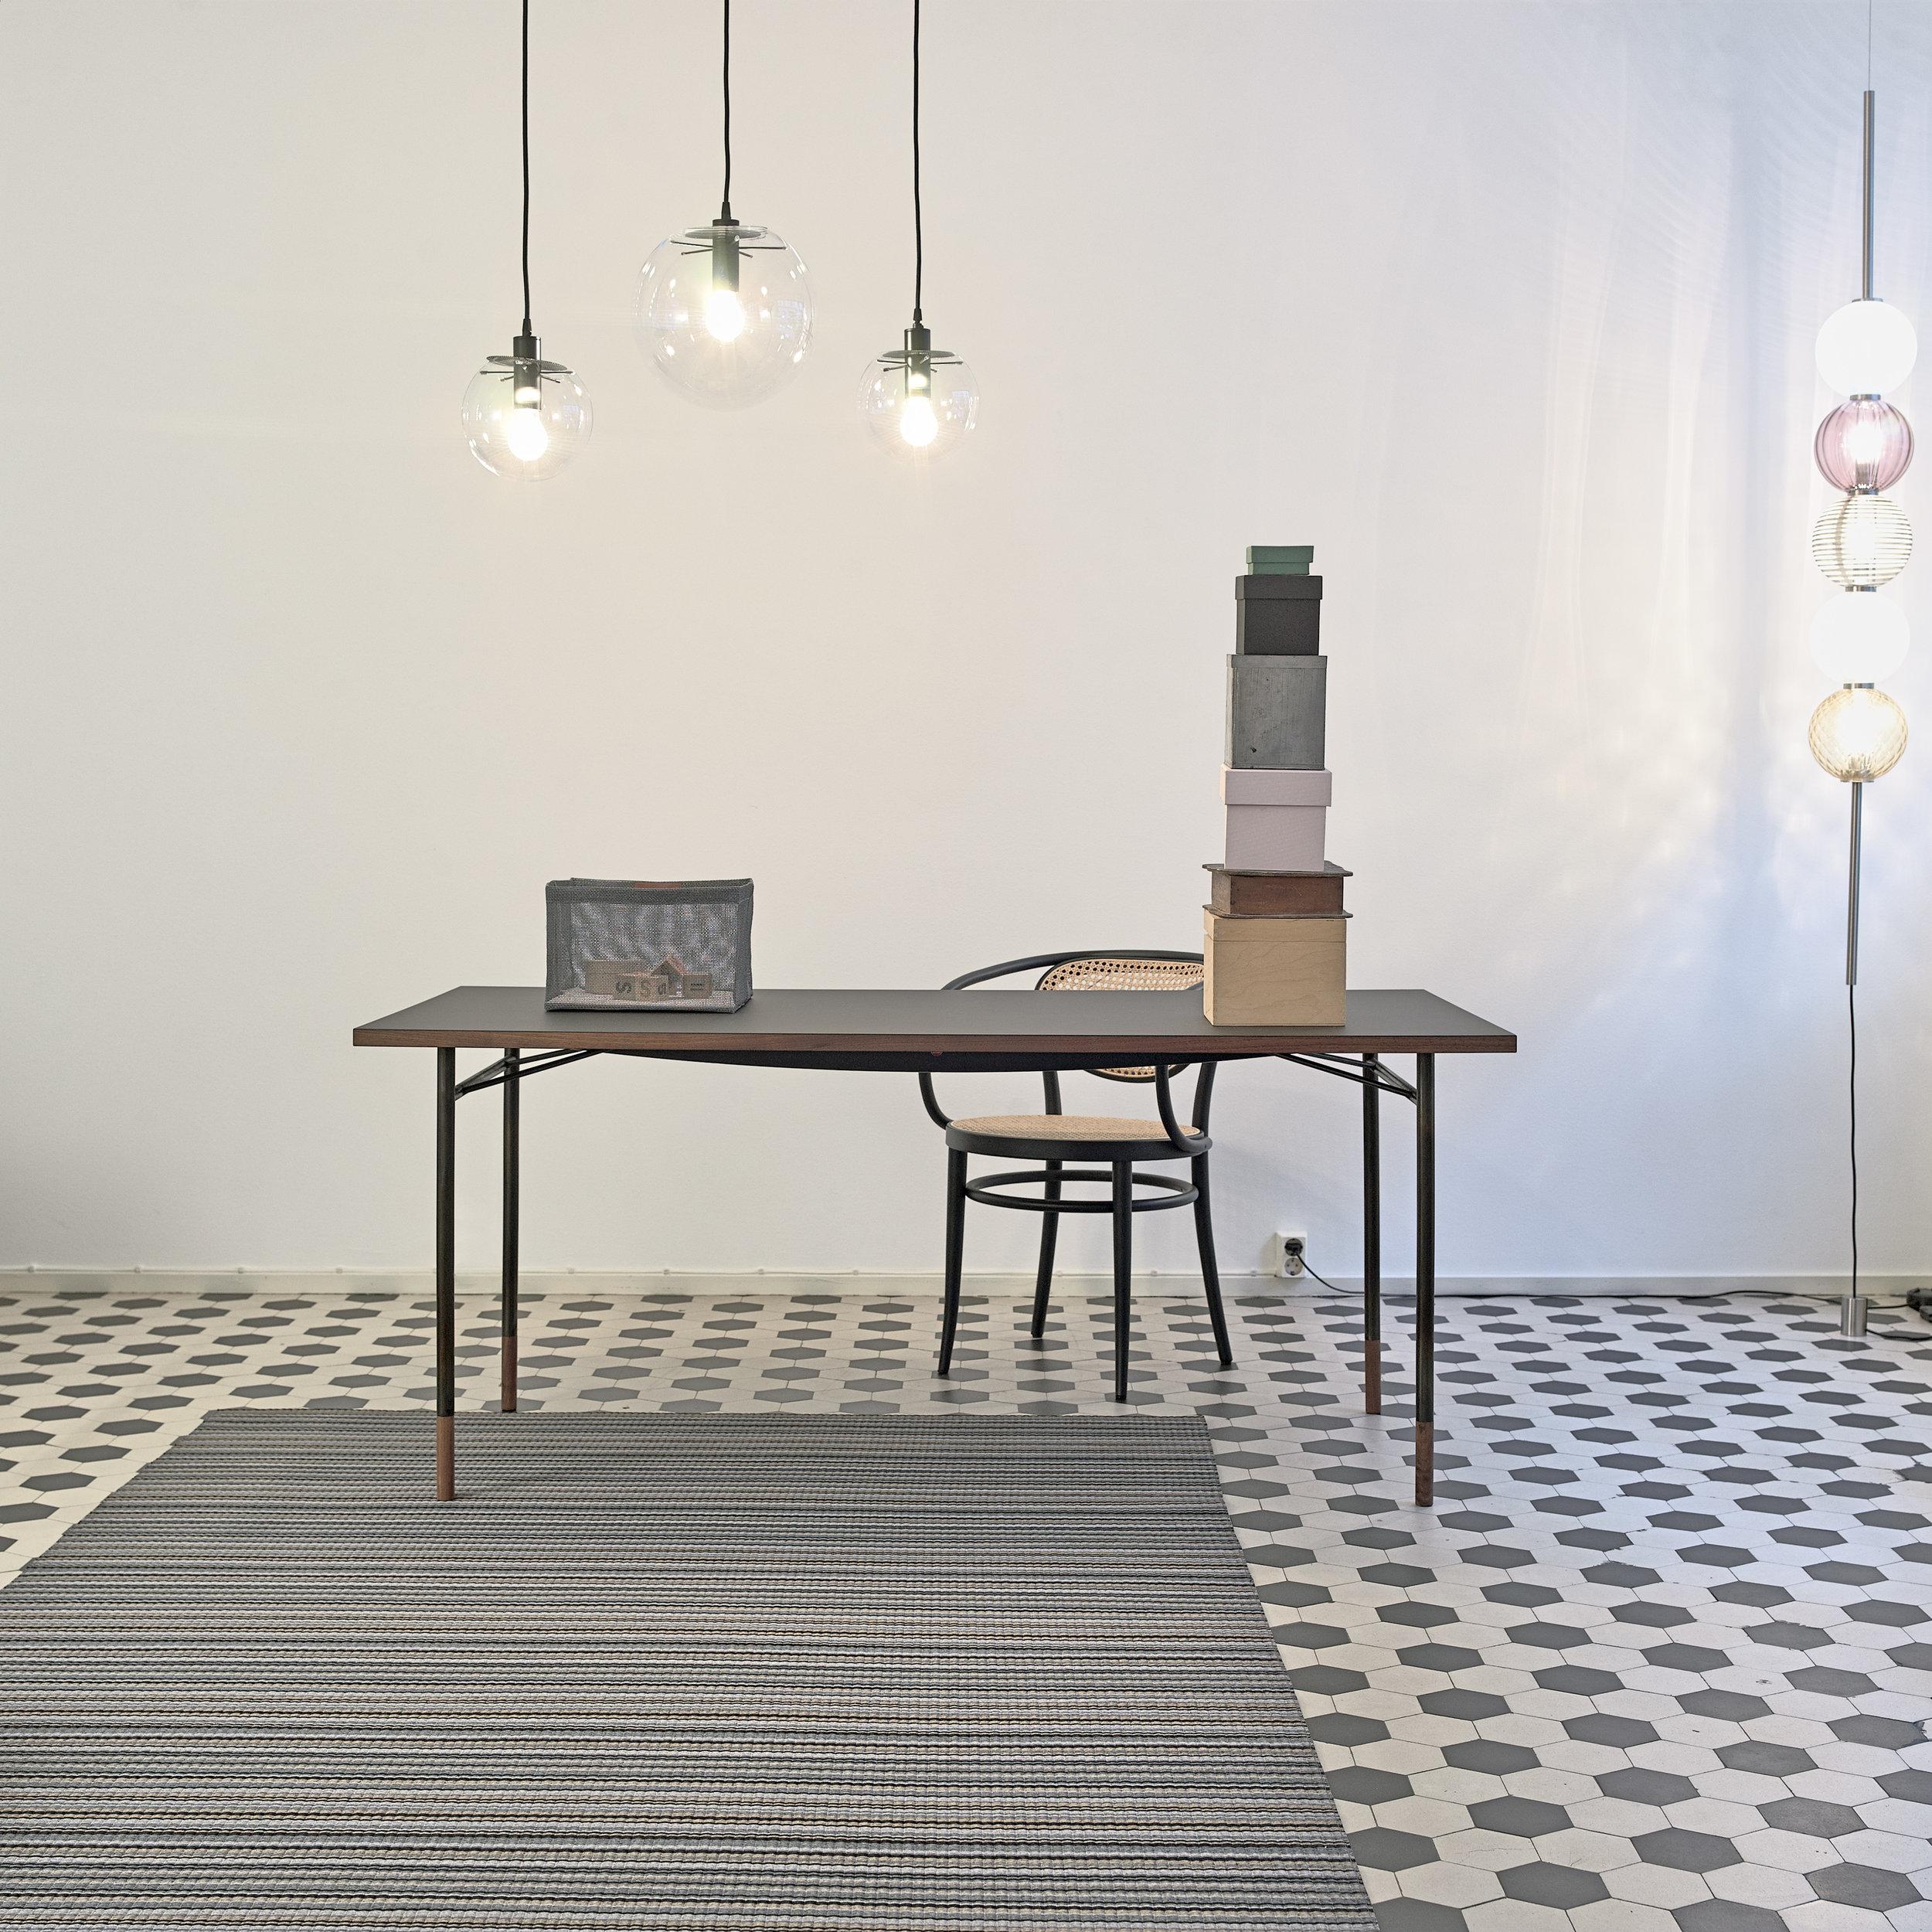 1394009  Midsummer  graphite-black paper yarn carpet